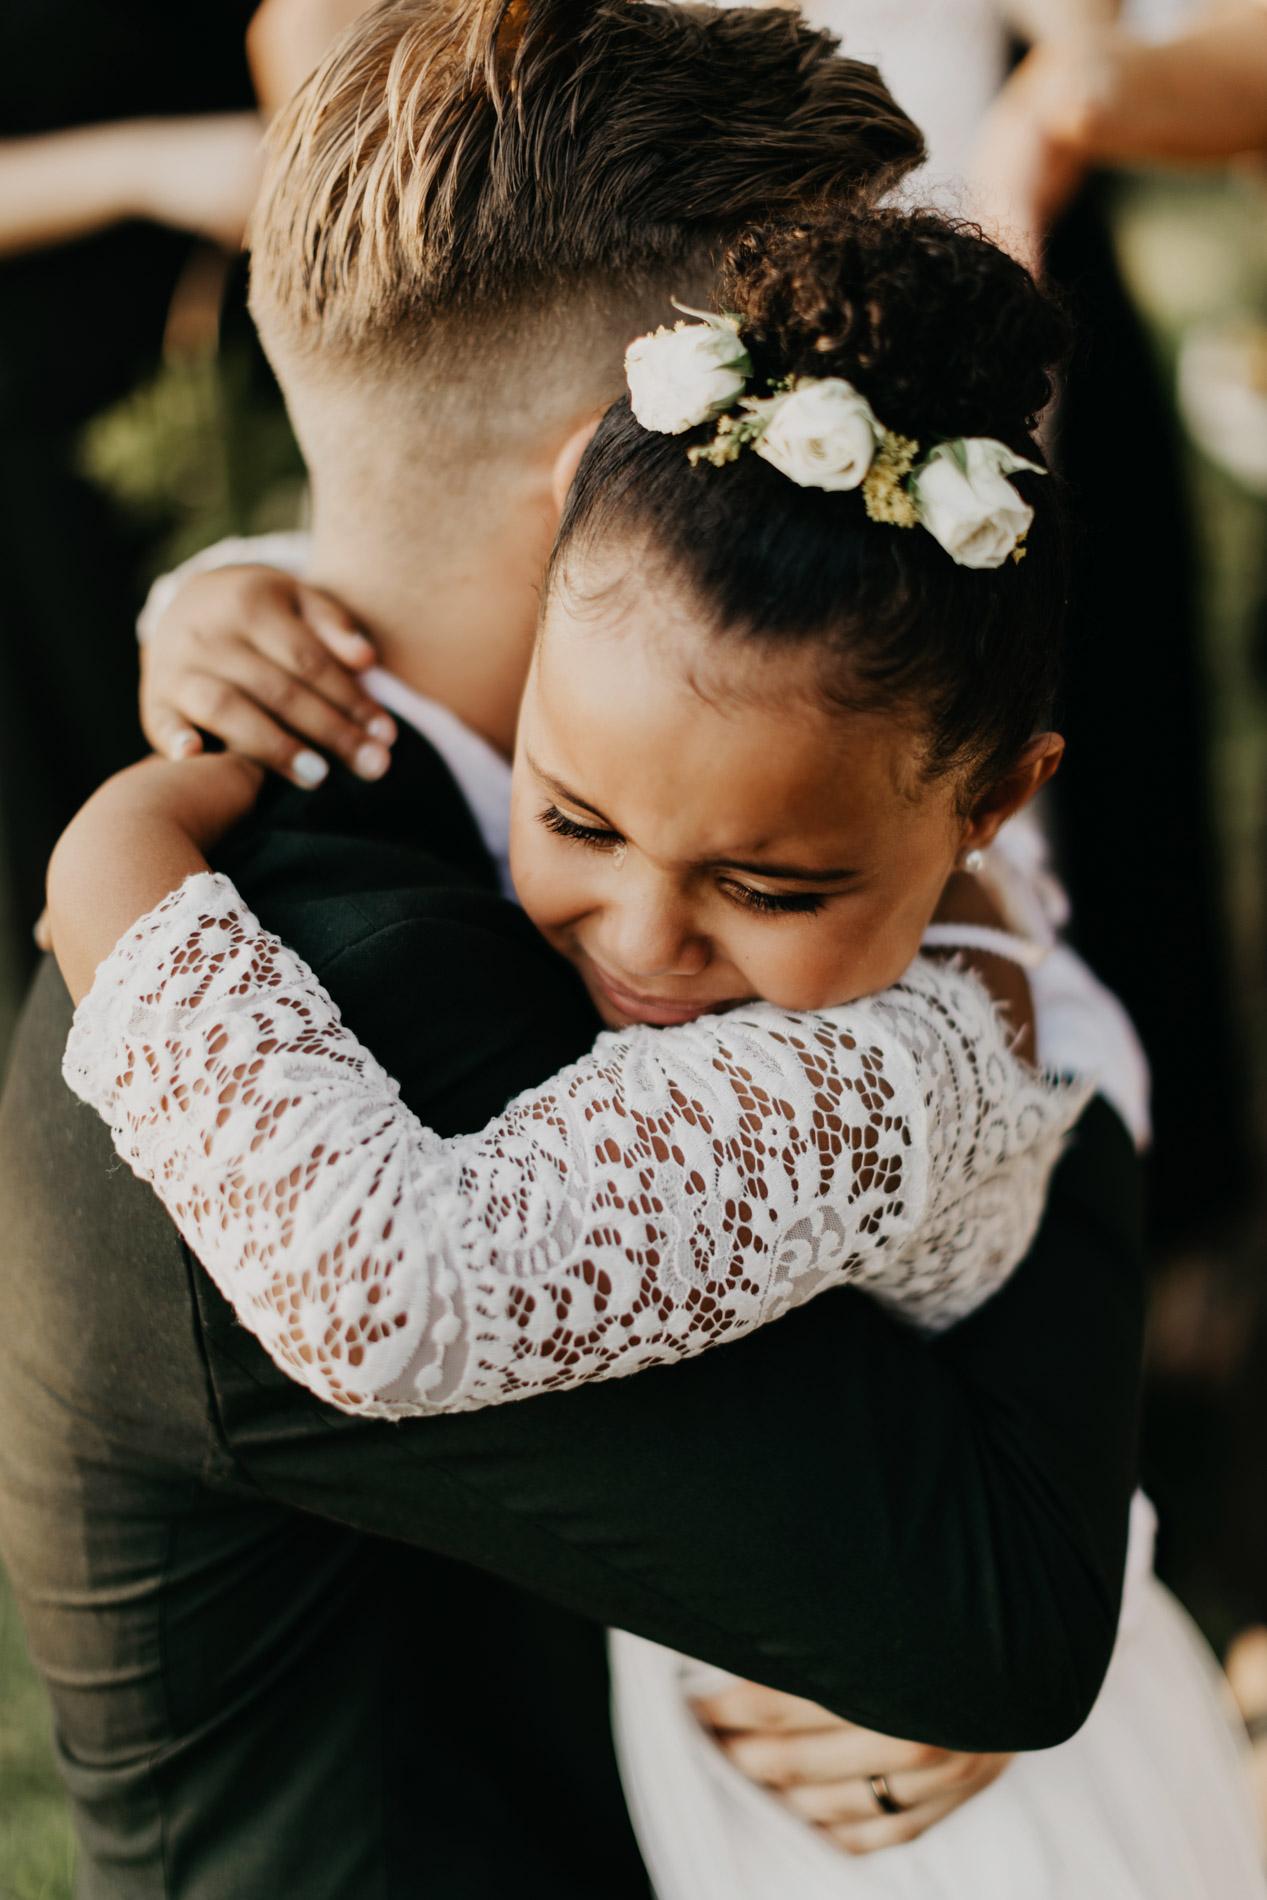 Brides little sister emotionally hugging the groom